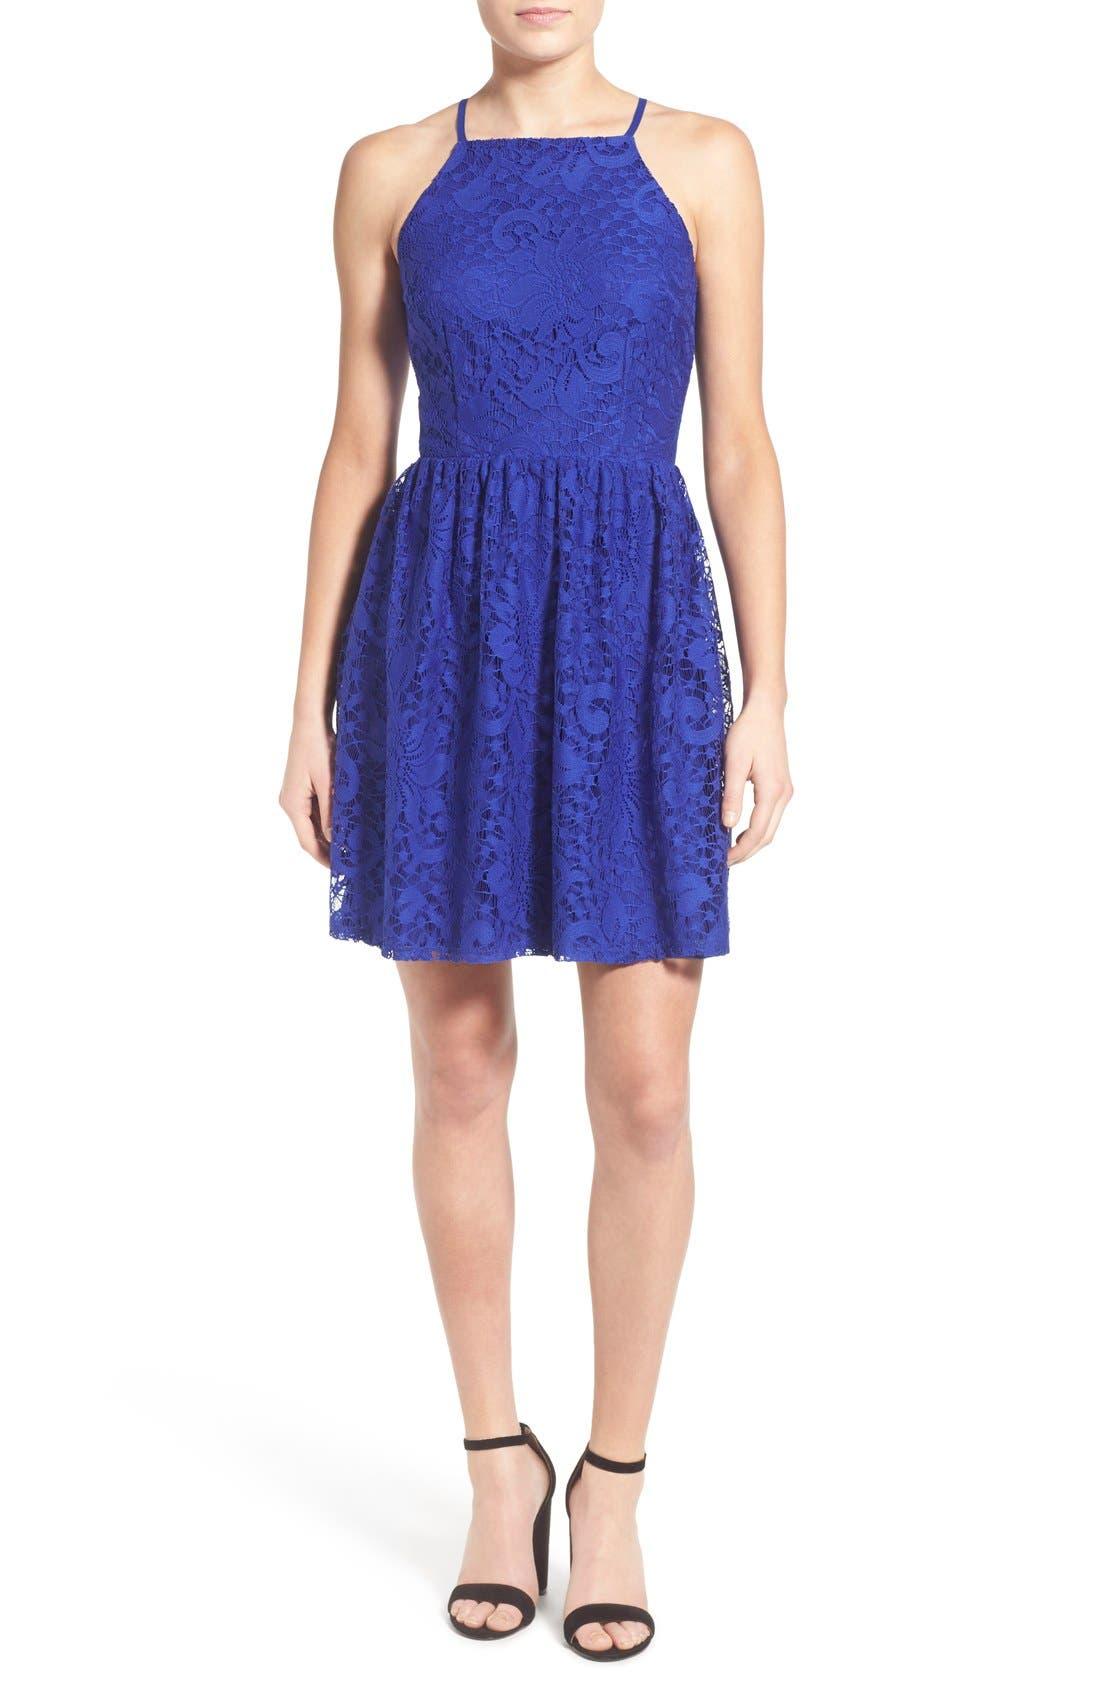 Alternate Image 1 Selected - Speechless Lace High Neck Skater Dress